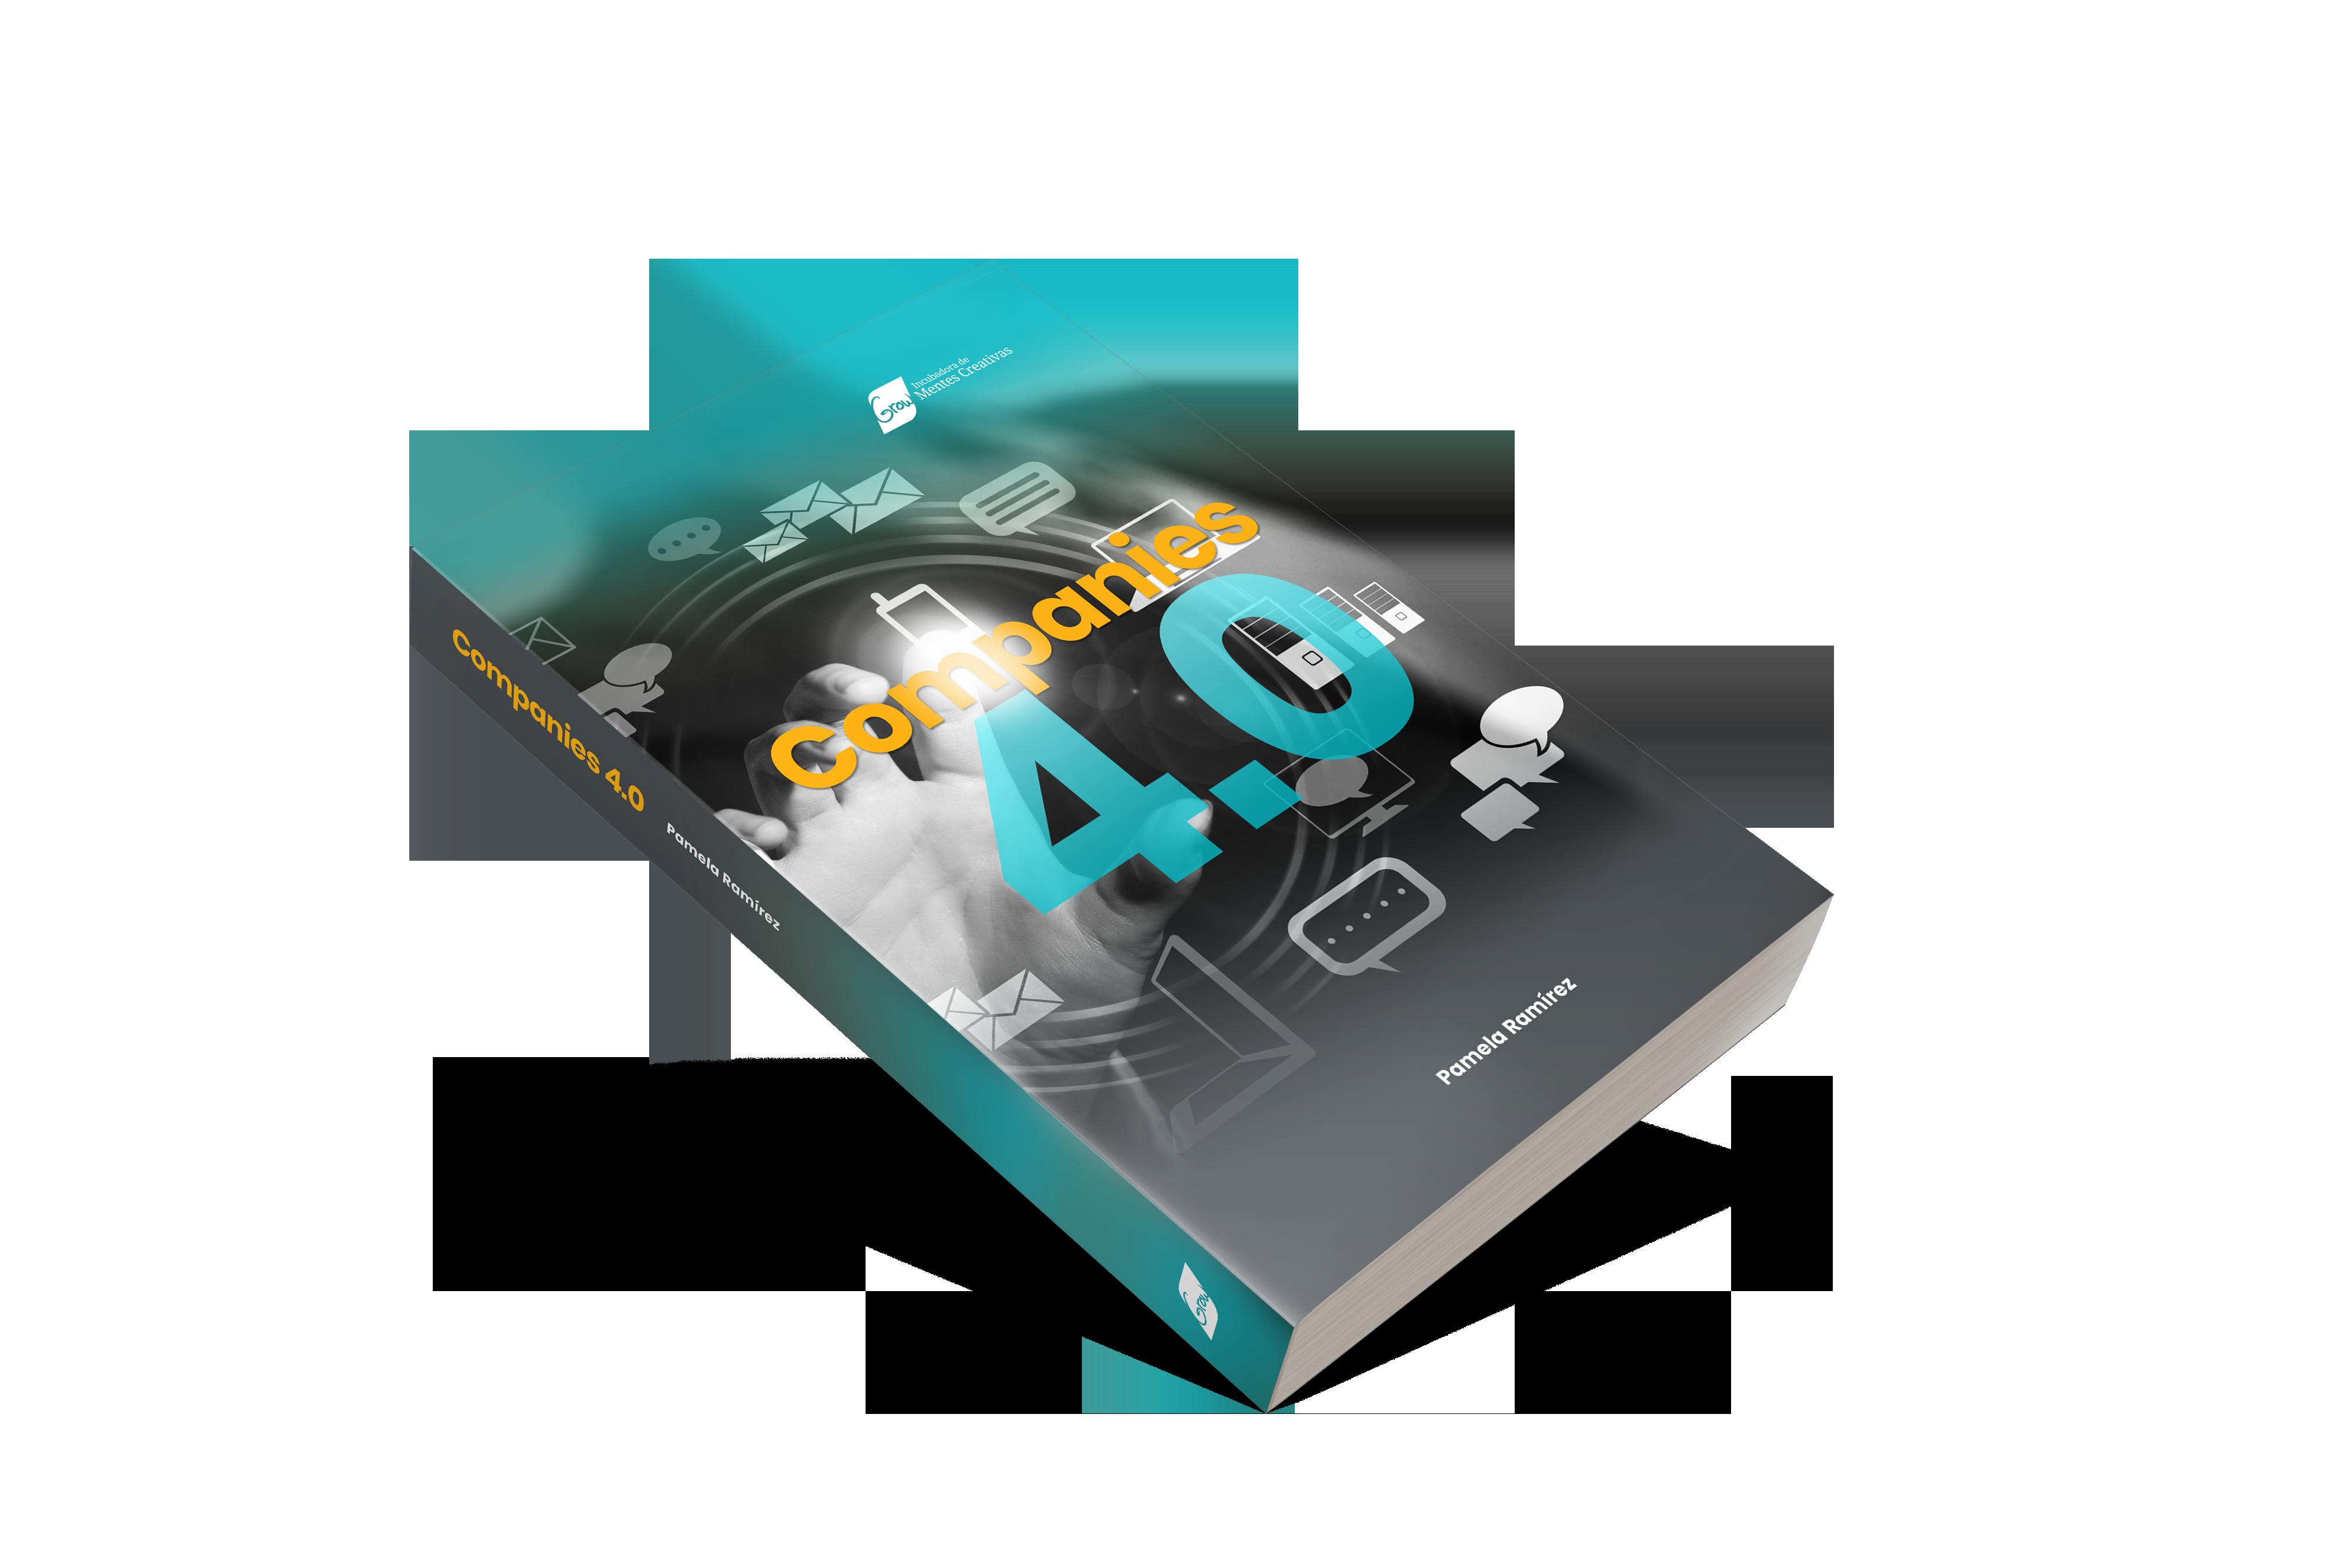 grow-mockup-ebook-empresas40-ing-02